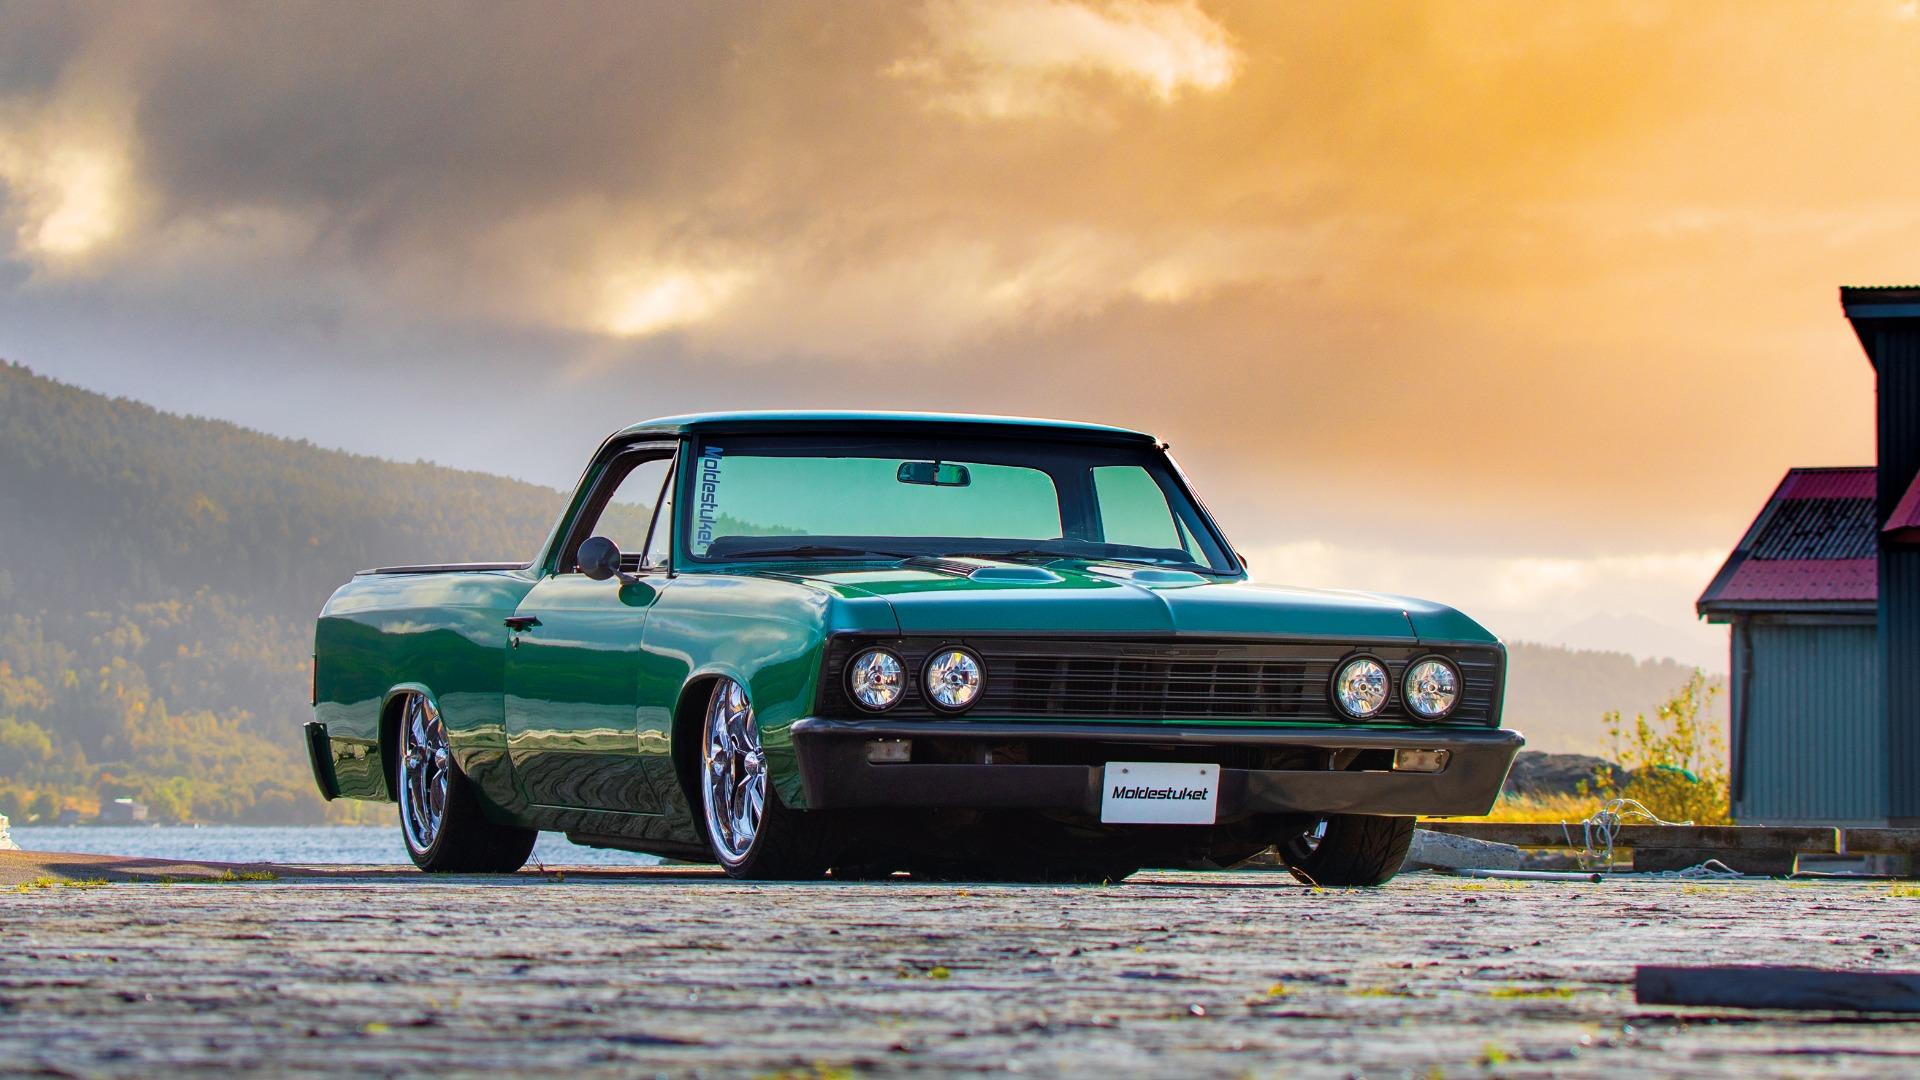 How low can you go? – 1967 Chevrolet El Camino